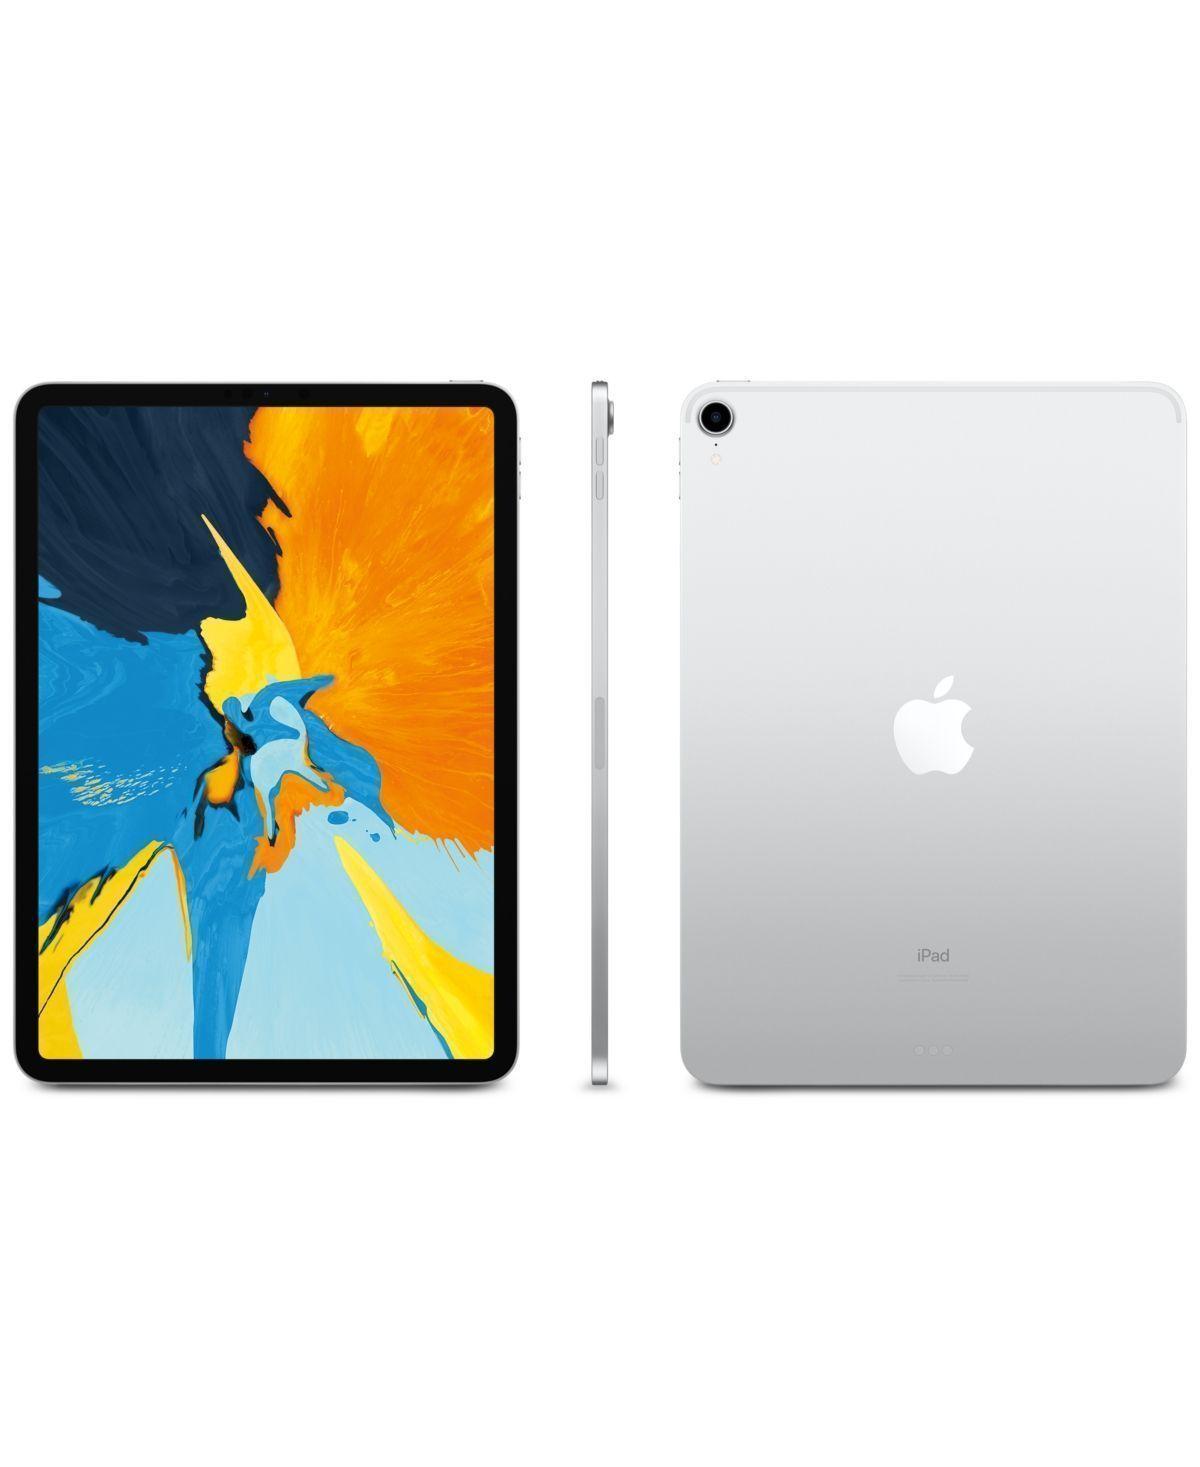 Apple 11 Inch Ipad Pro Wi Fi 512gb Silver Apple Ipad Ipad Pro Apple Ipad Pro